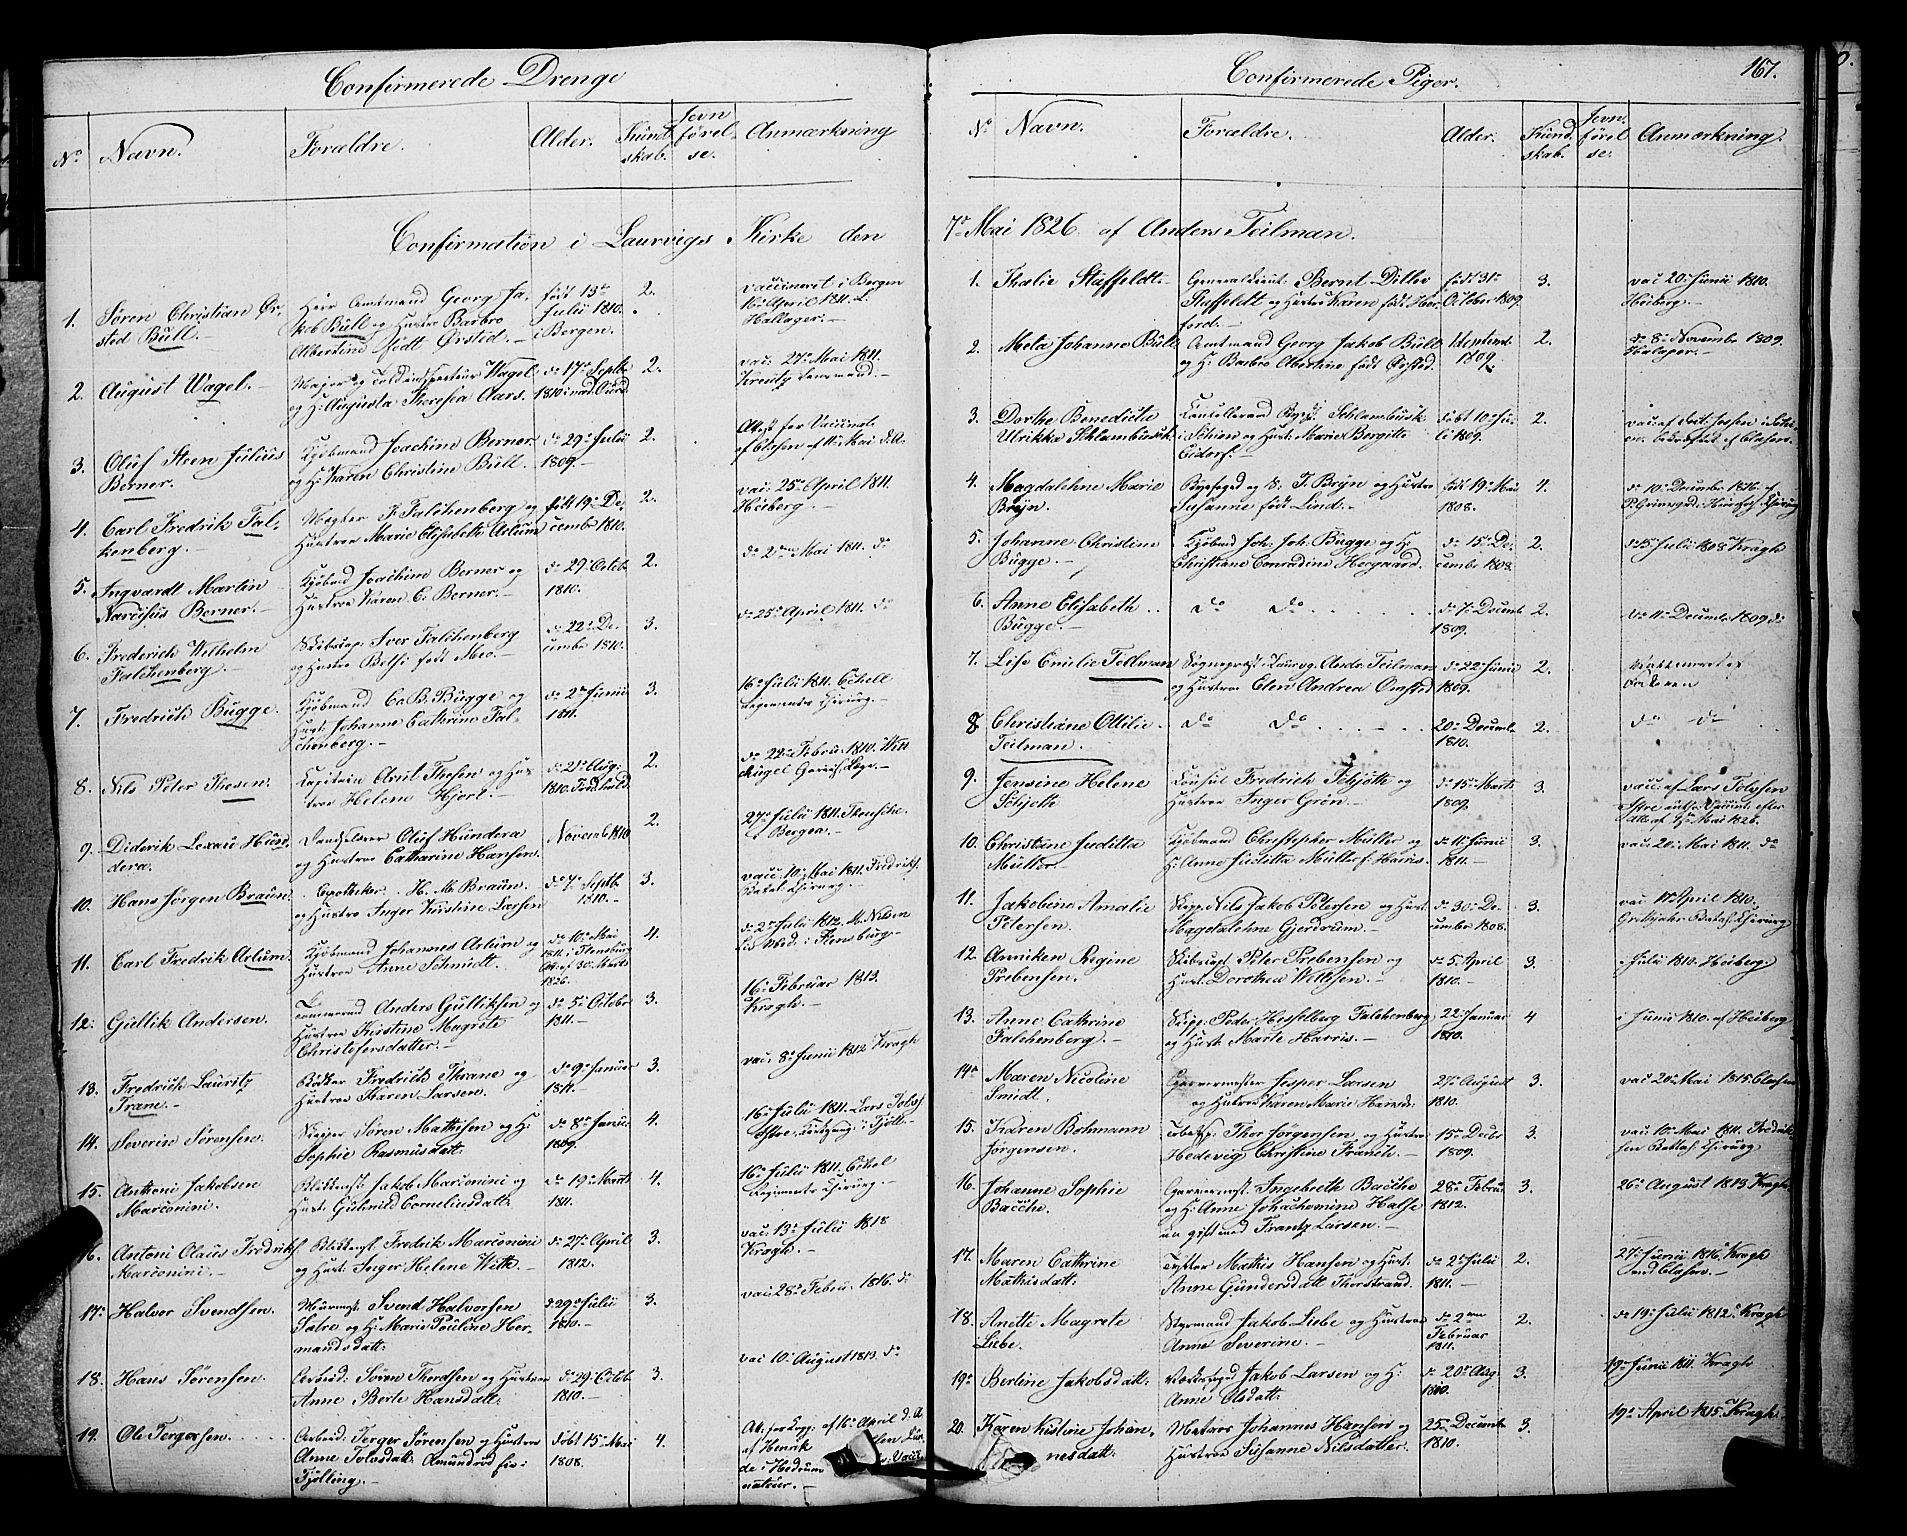 SAKO, Larvik kirkebøker, F/Fa/L0002: Ministerialbok nr. I 2, 1825-1847, s. 167